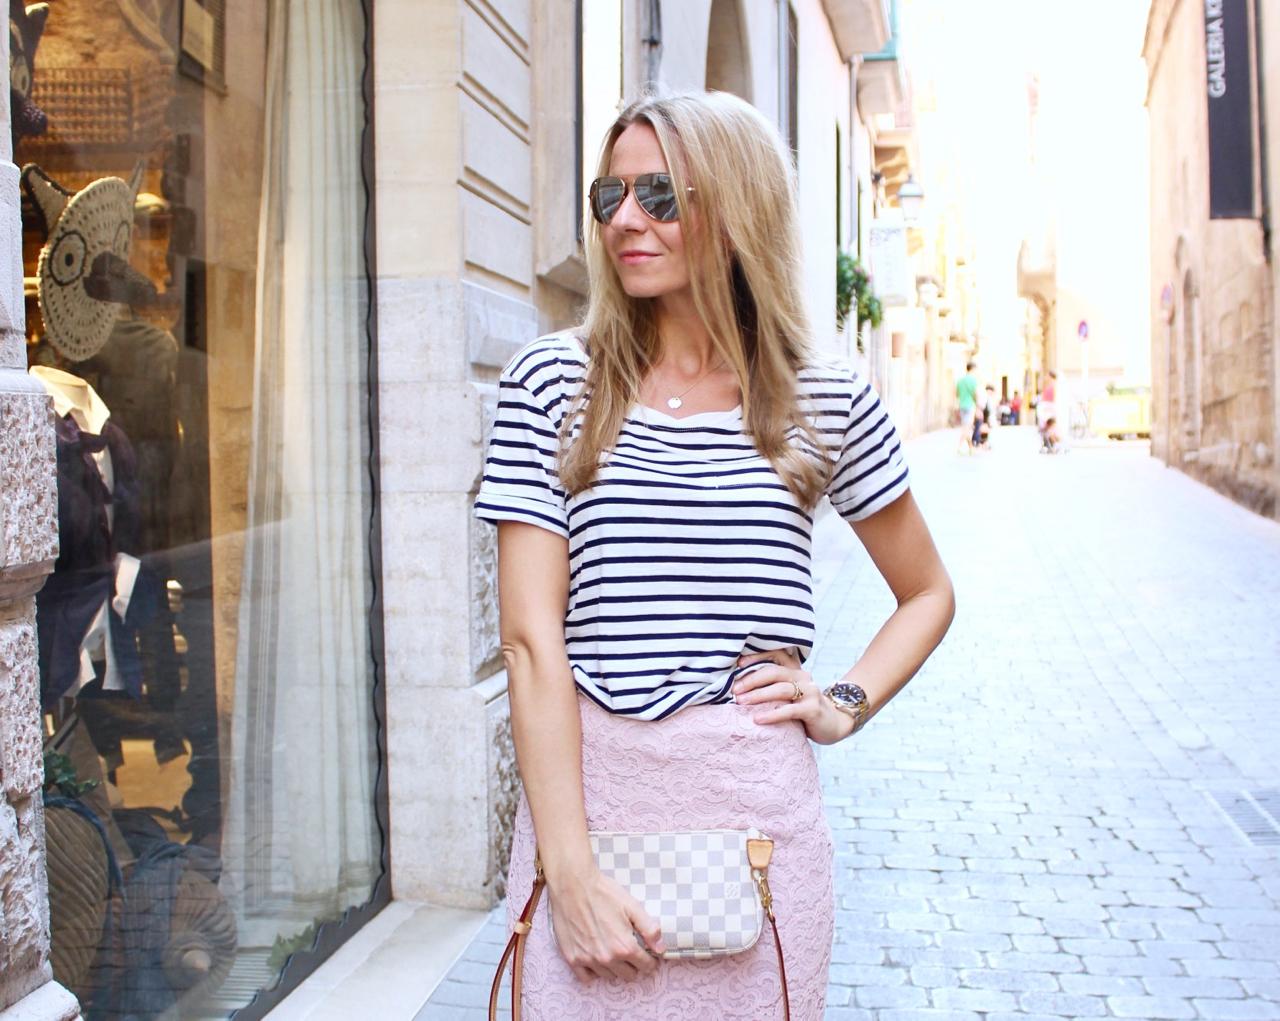 Sightseeing in Palma mit Spitzenrock und Ringelshirt Outfit Fashion Jennifer Lifestyle Zara Mode LouisVuitton LV Vuitton LVOE PepperAndGold Pochette Jenni PorscheDesign Asos Mallorca